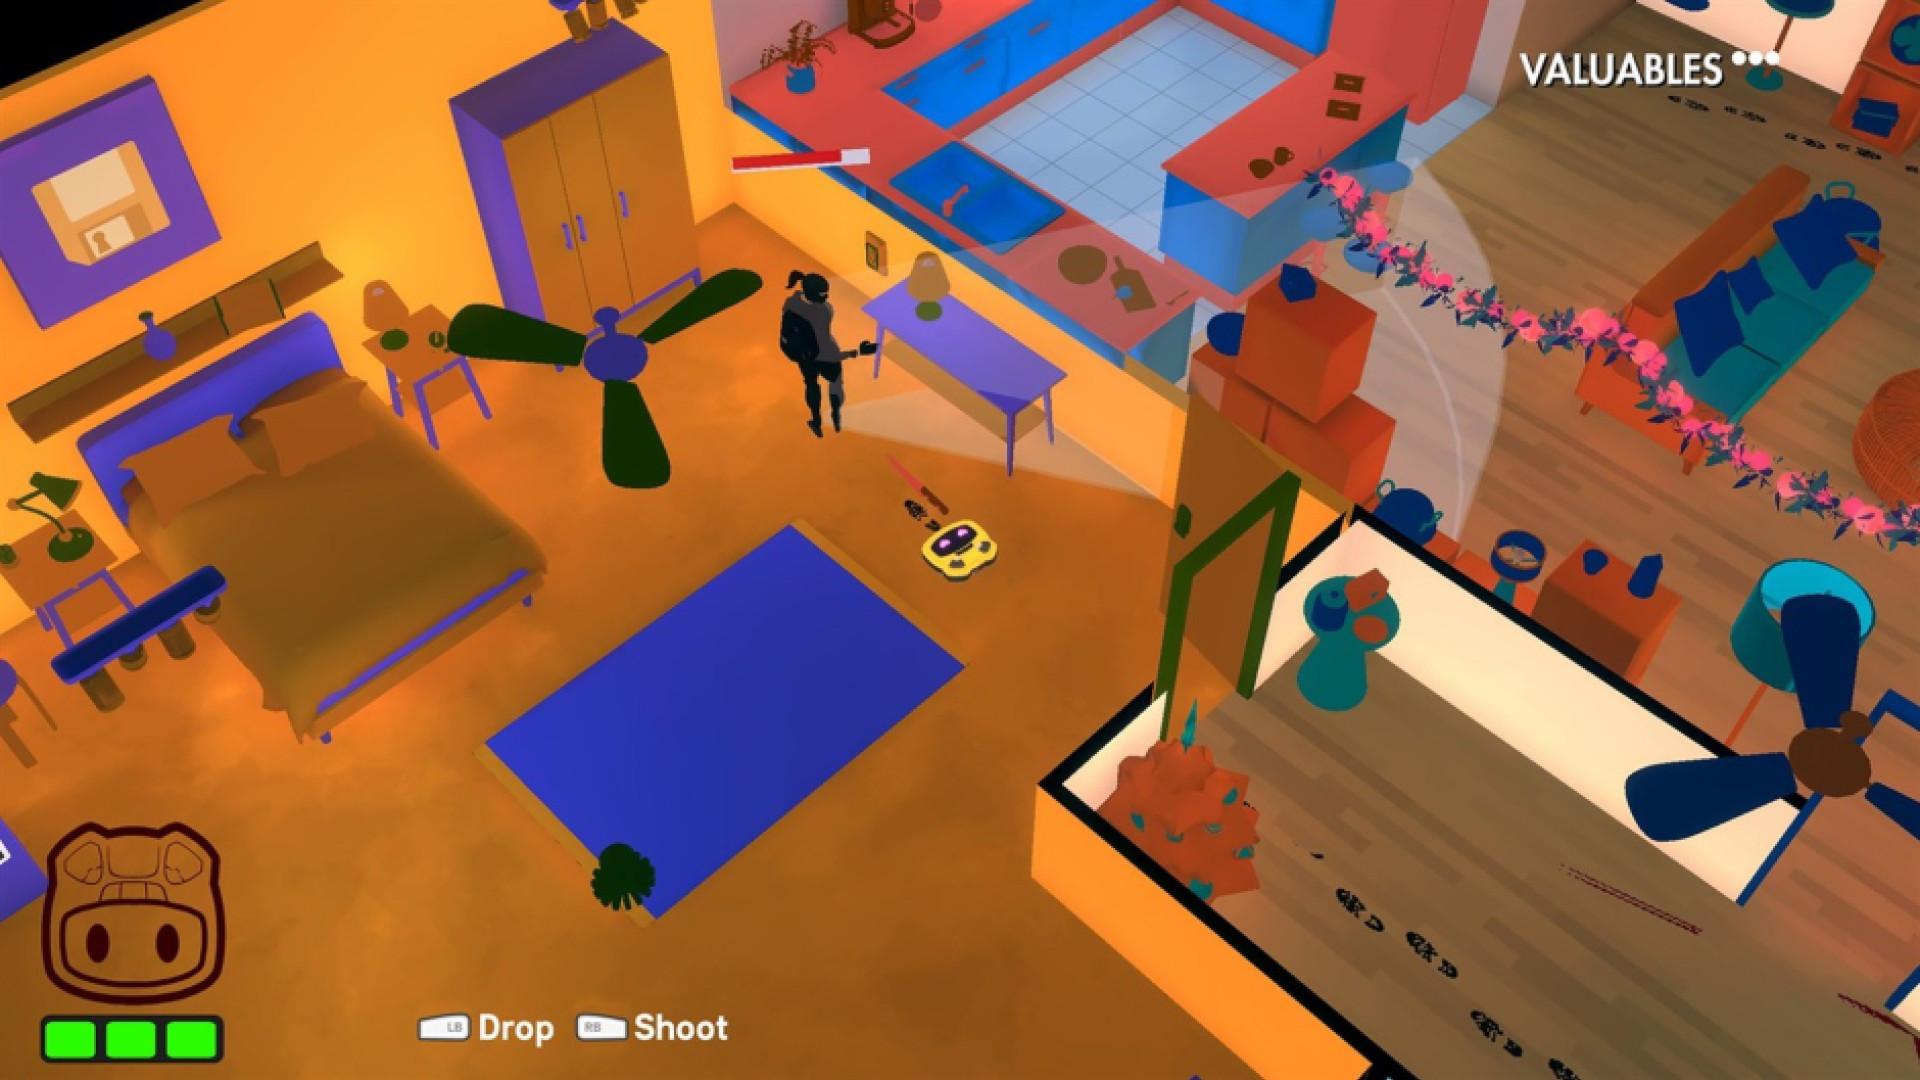 Roombo: First Blood - February 5 - Xbox One X Enhanced